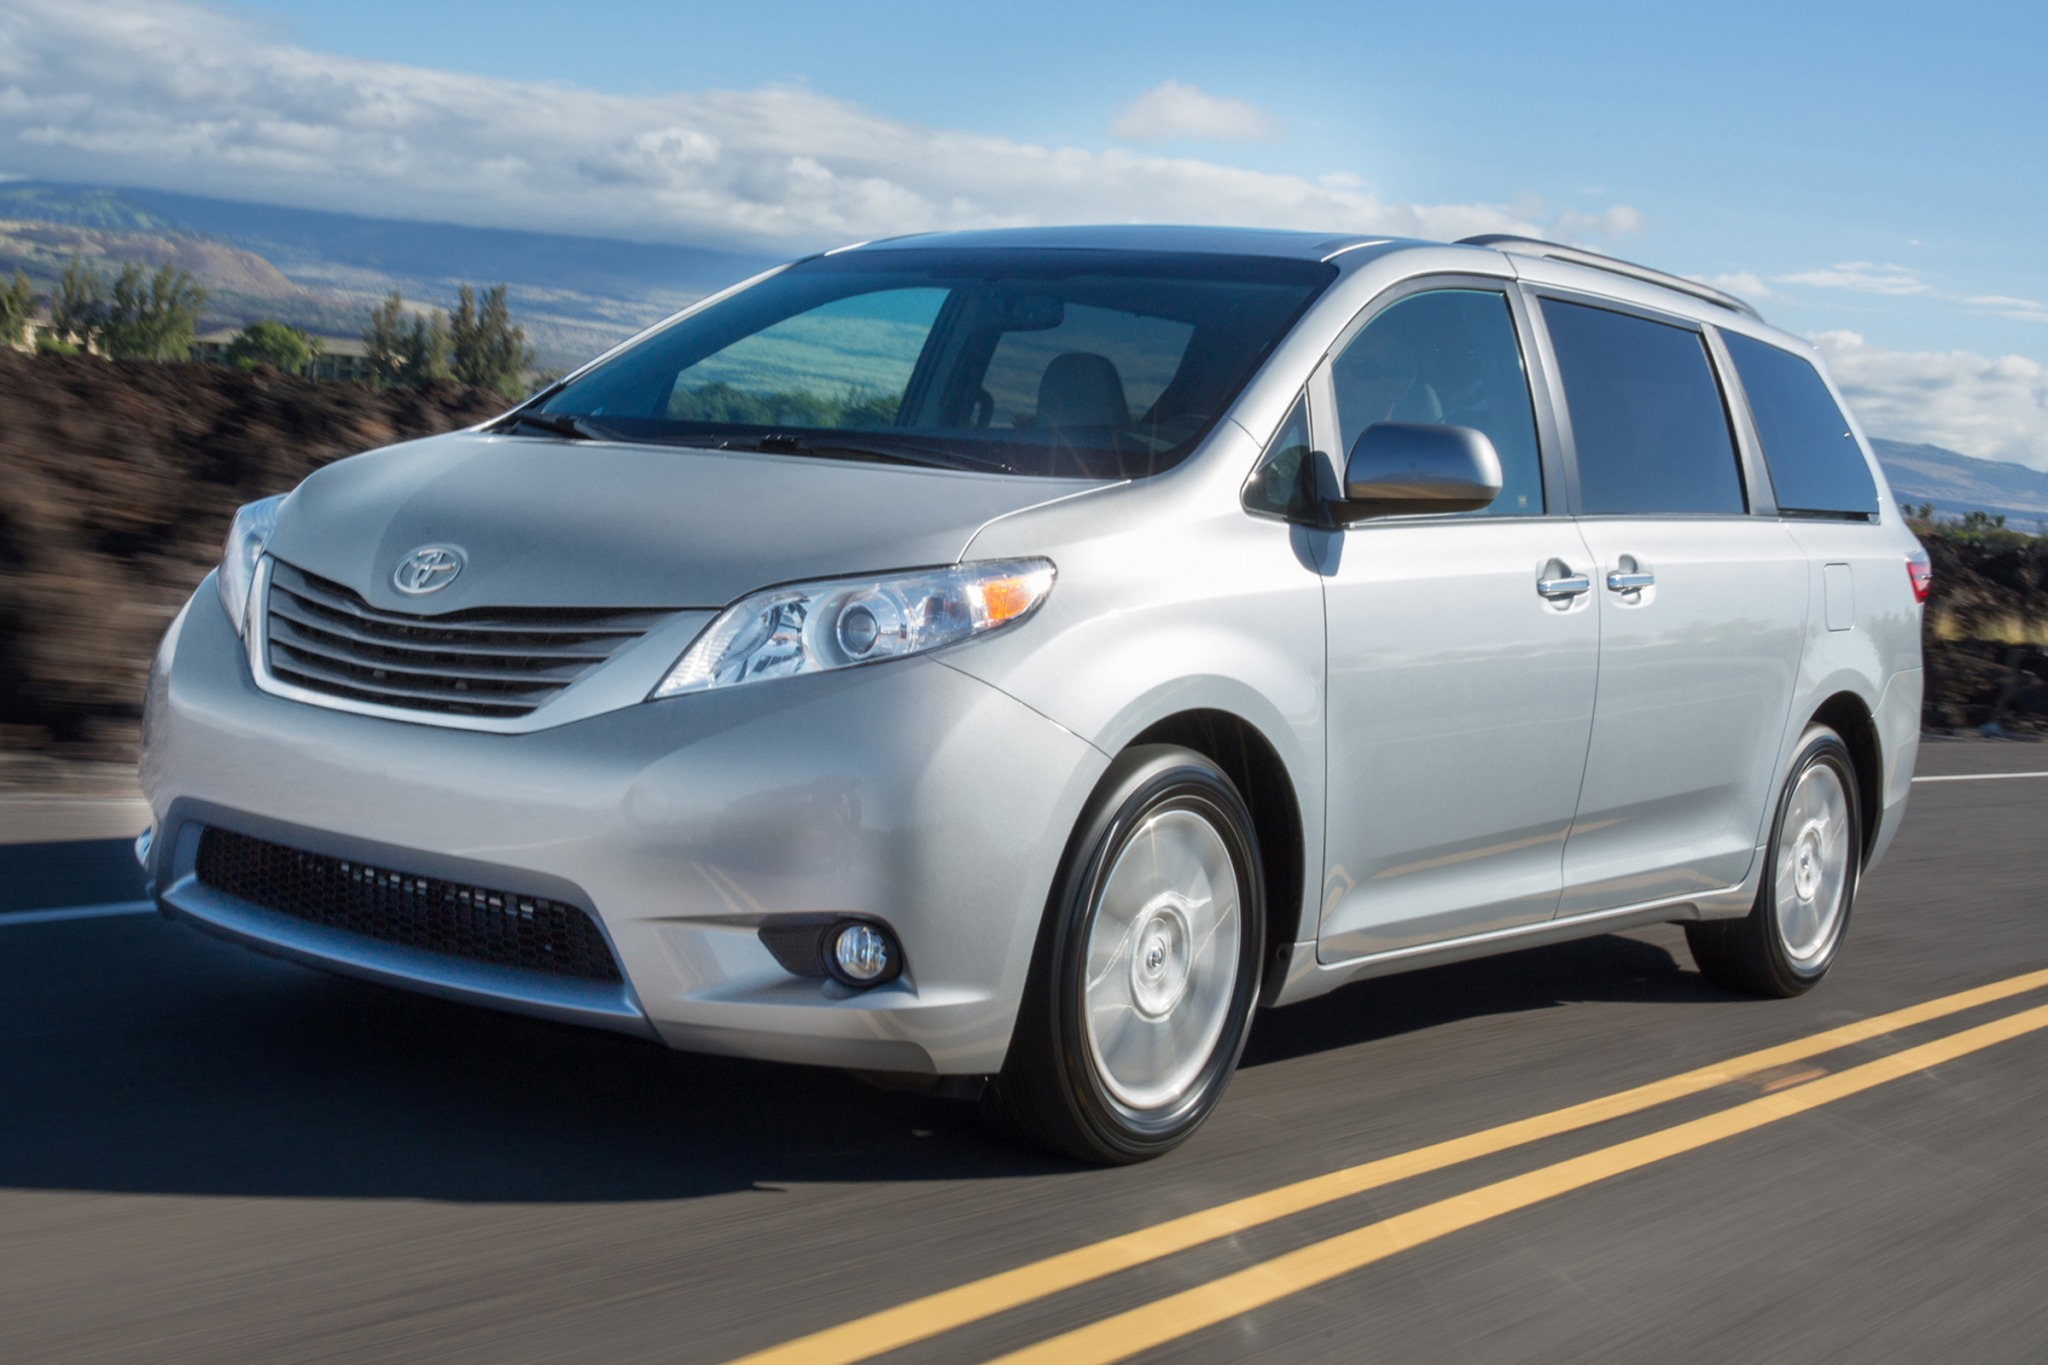 2016 toyota sienna passenger minivan xle premium 7 passenger fq oem 1 2048